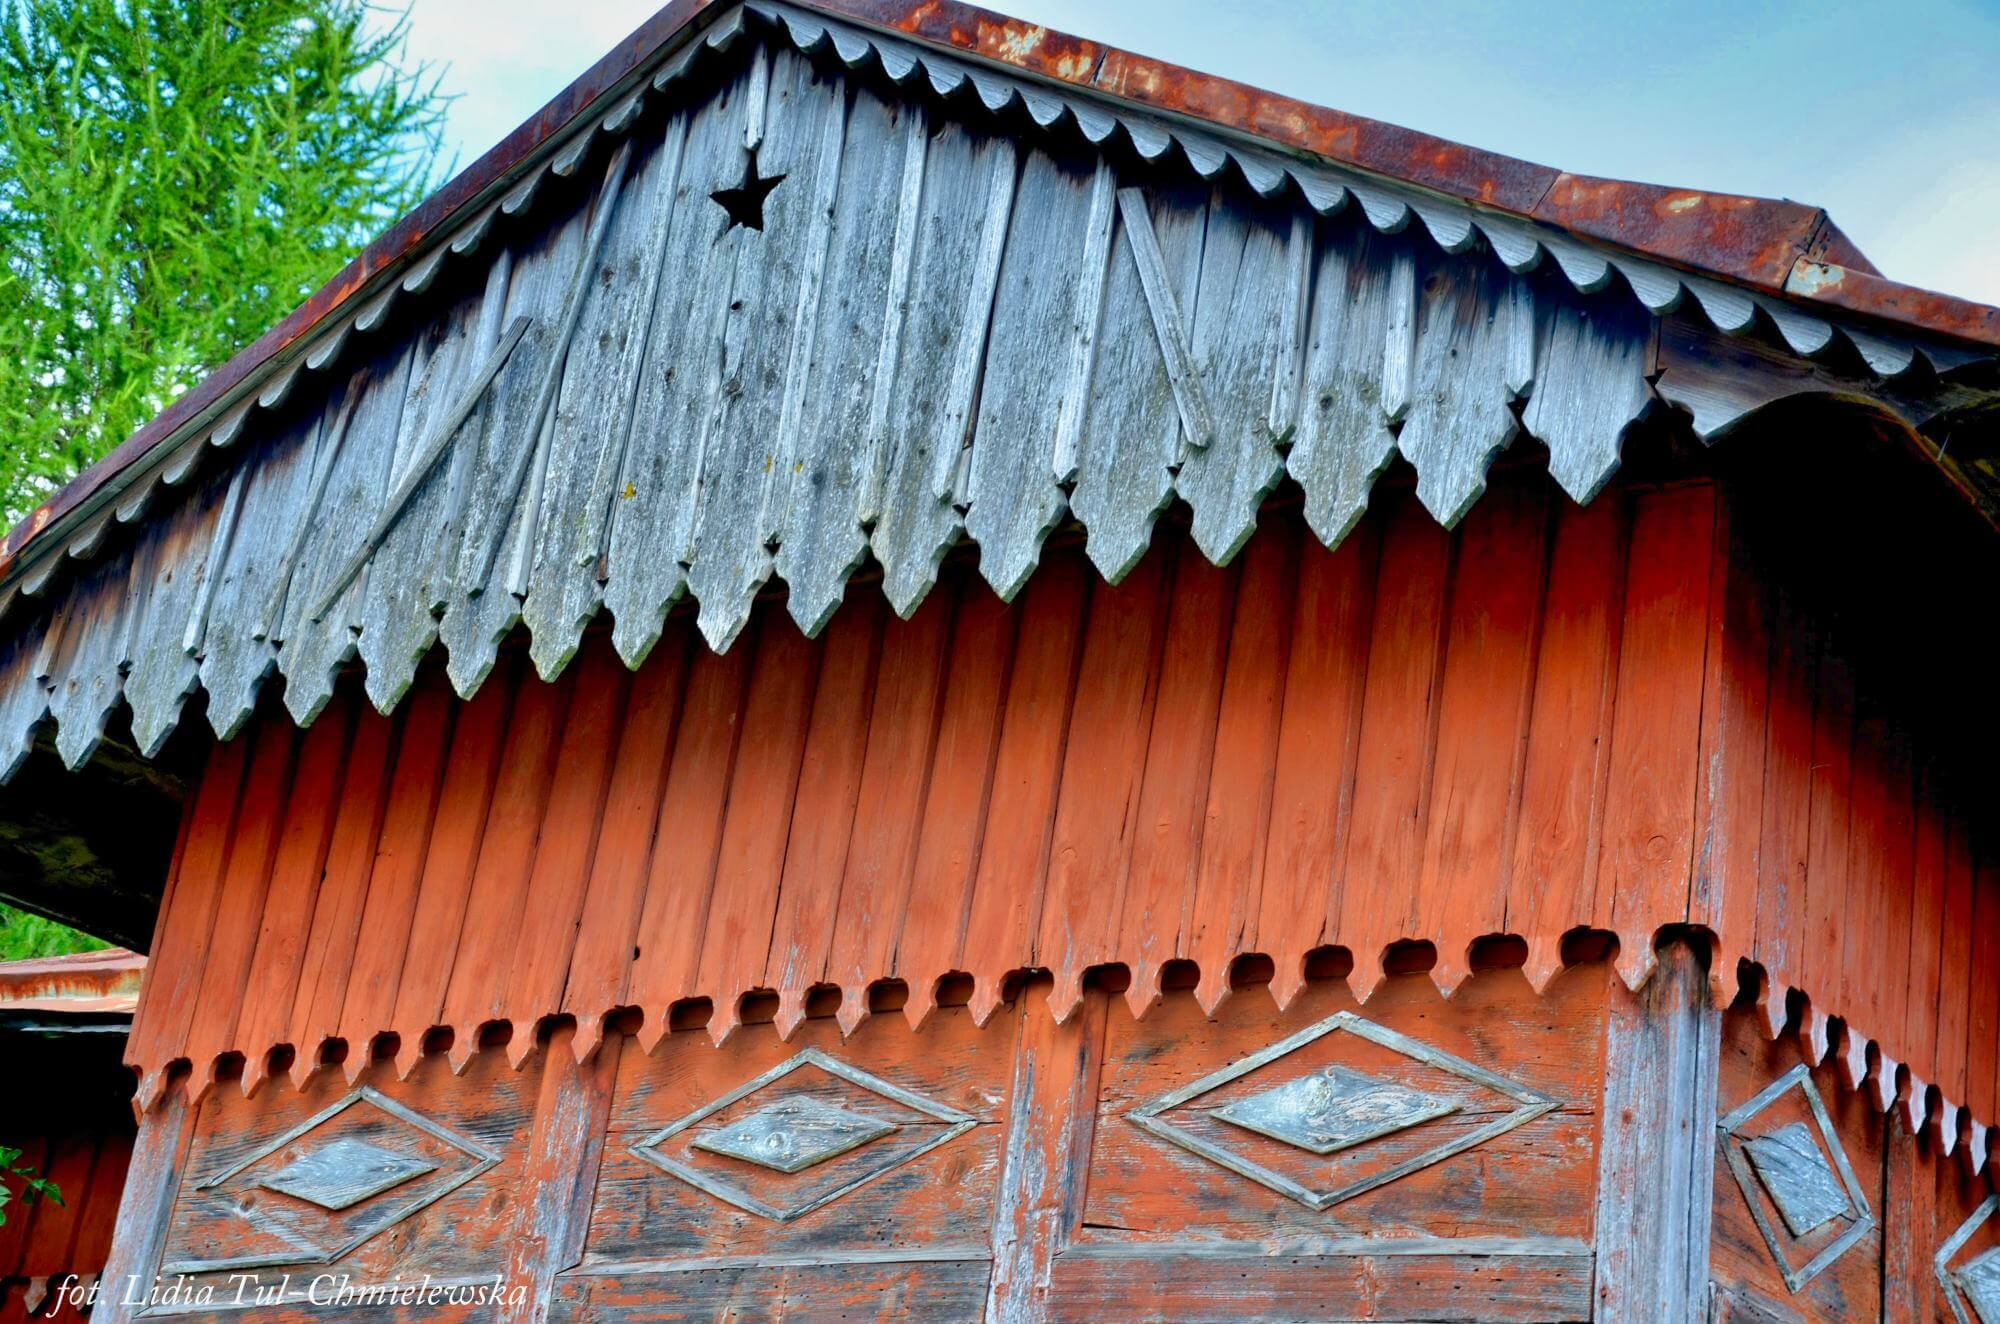 Drewniana architektura, Jaśliska / fot. Lidia Tul-Chmielewska